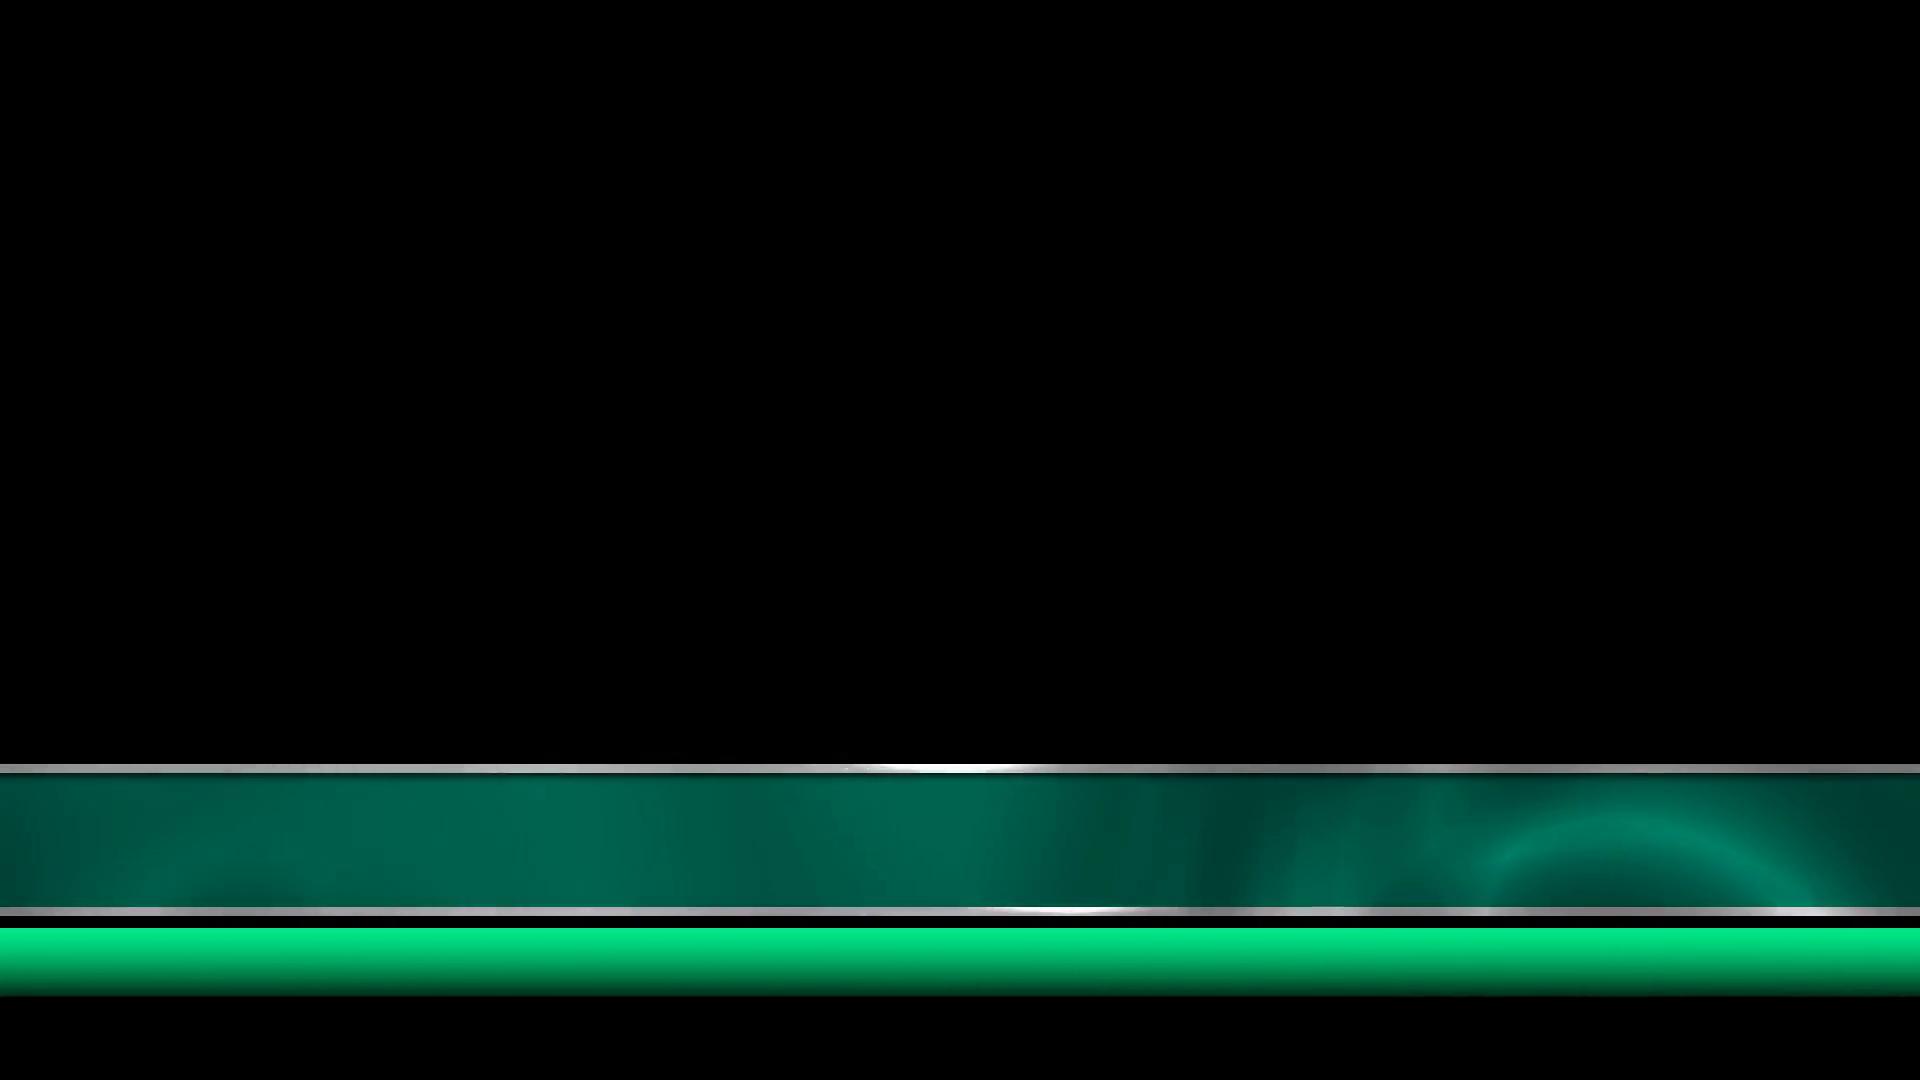 018 News Lower Third Green Zkqeotulr F0000 Free Thirds.